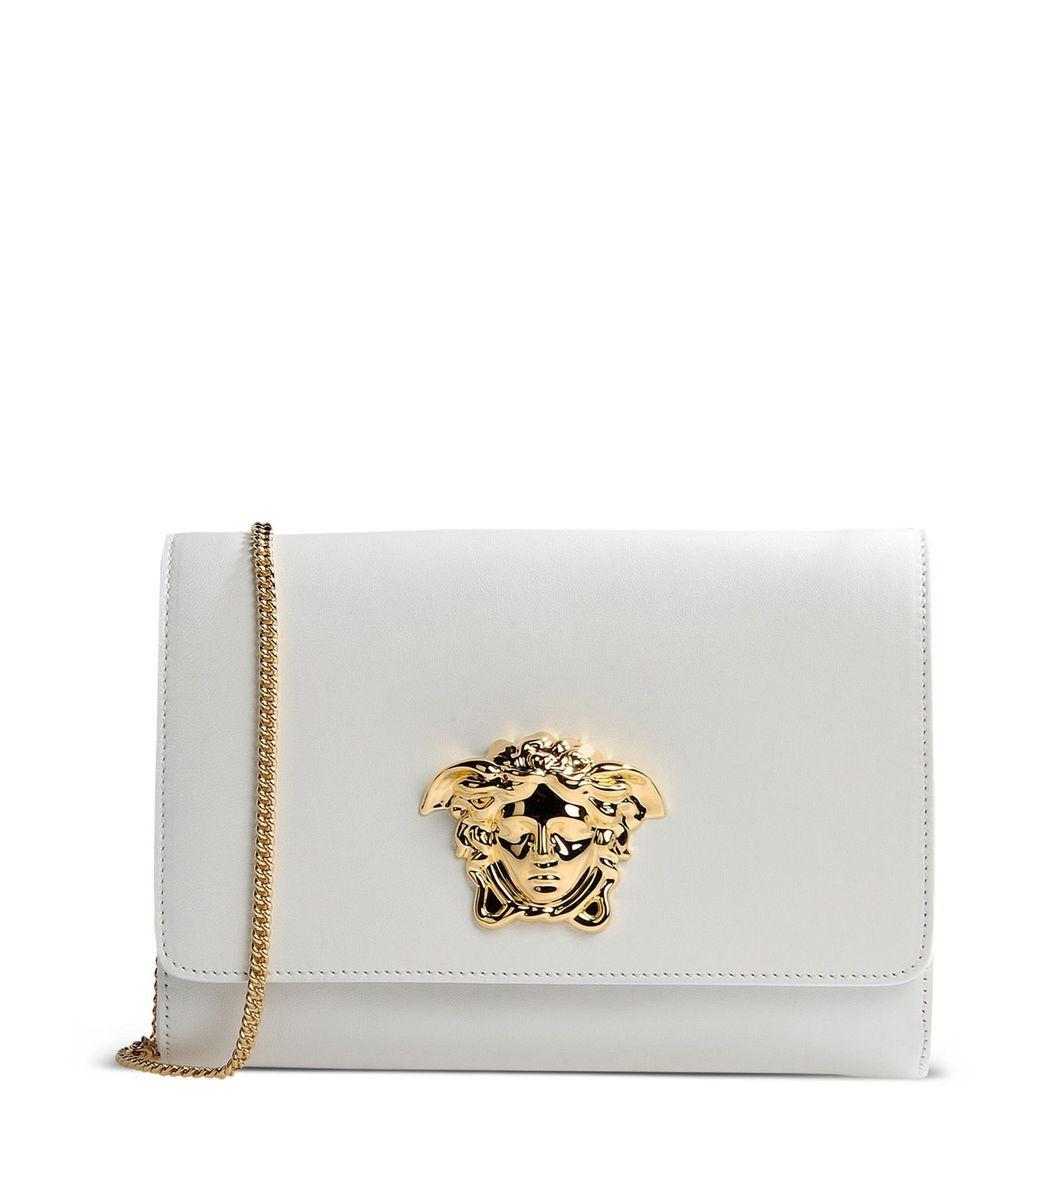 7777ae5426 Versace White Medusa Clutch | Bags | Versace purses, Versace bag ...